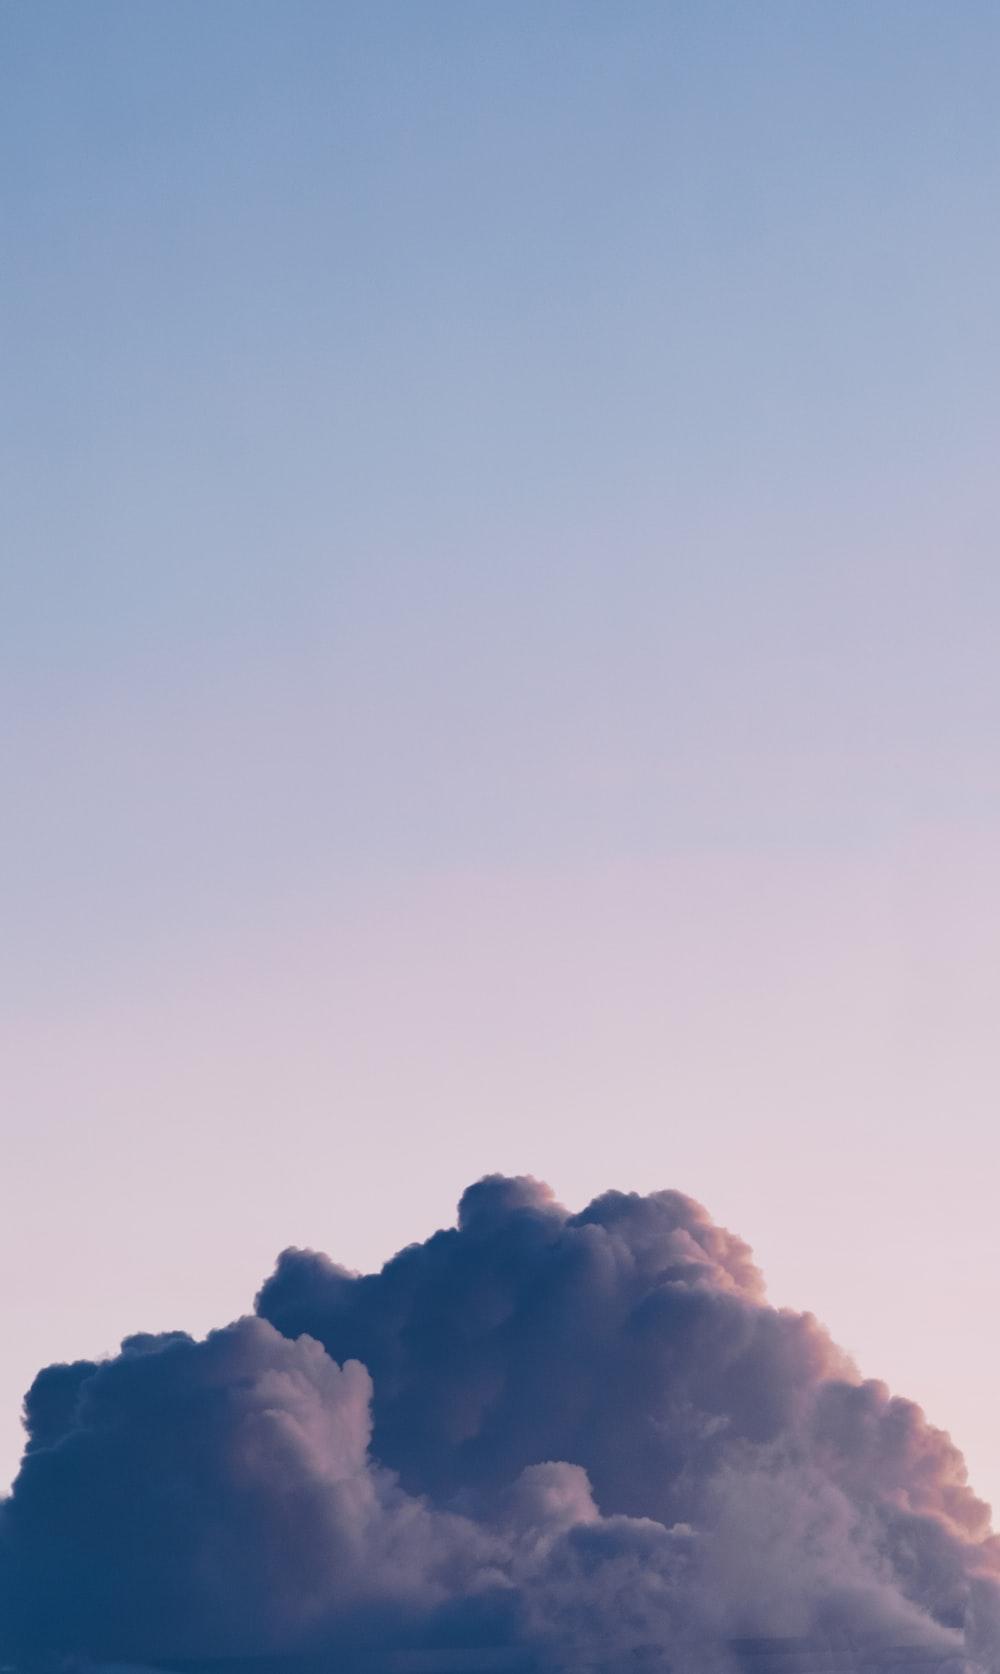 view of nimbus clouds